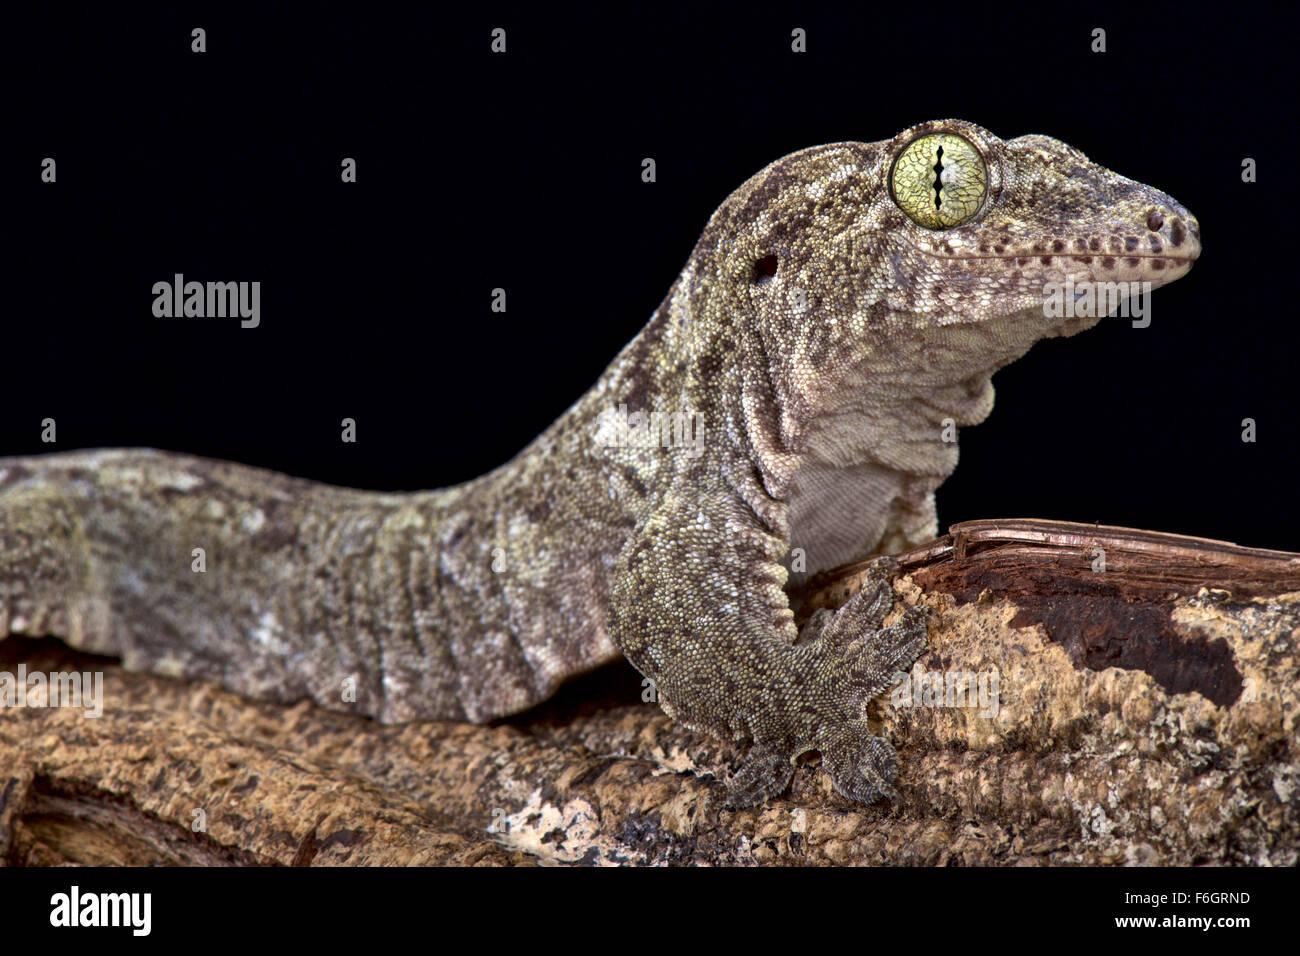 Oceanic Gecko (Gehyra oceanica) - Stock Image